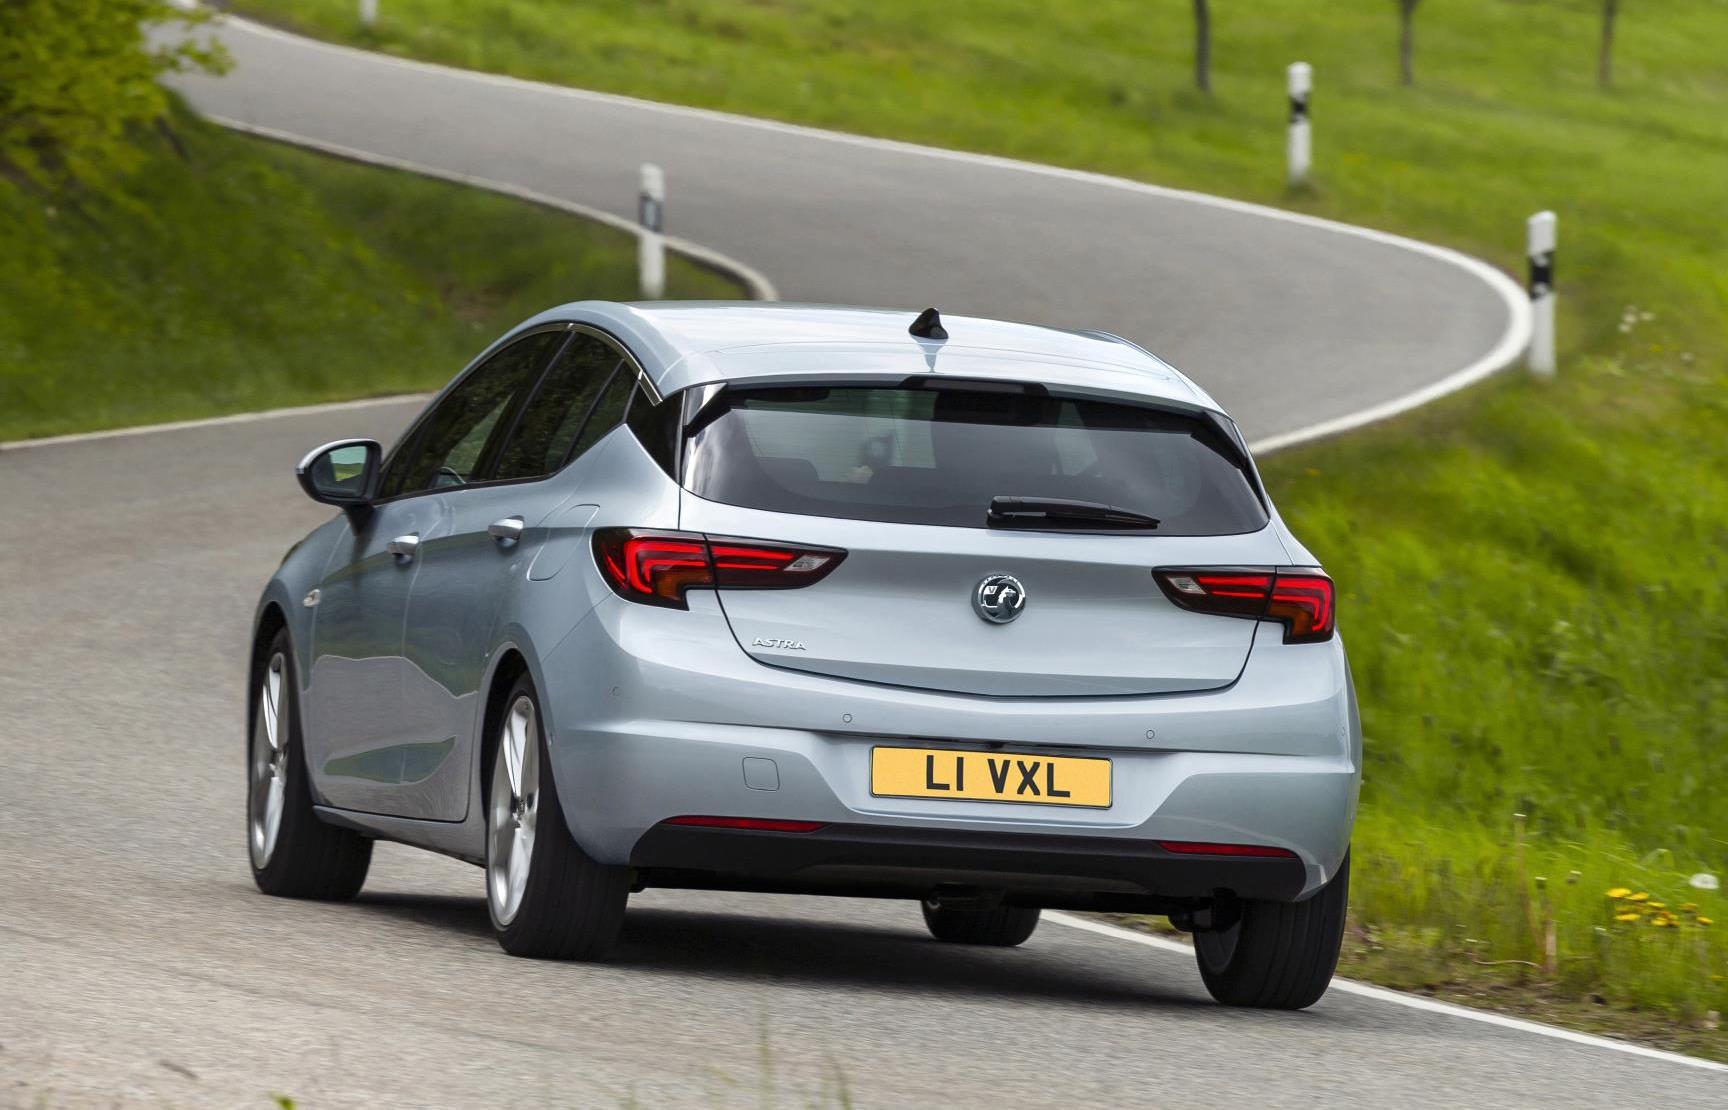 2020 Vauxhall/Opel Astra revealed; new powertrains ...